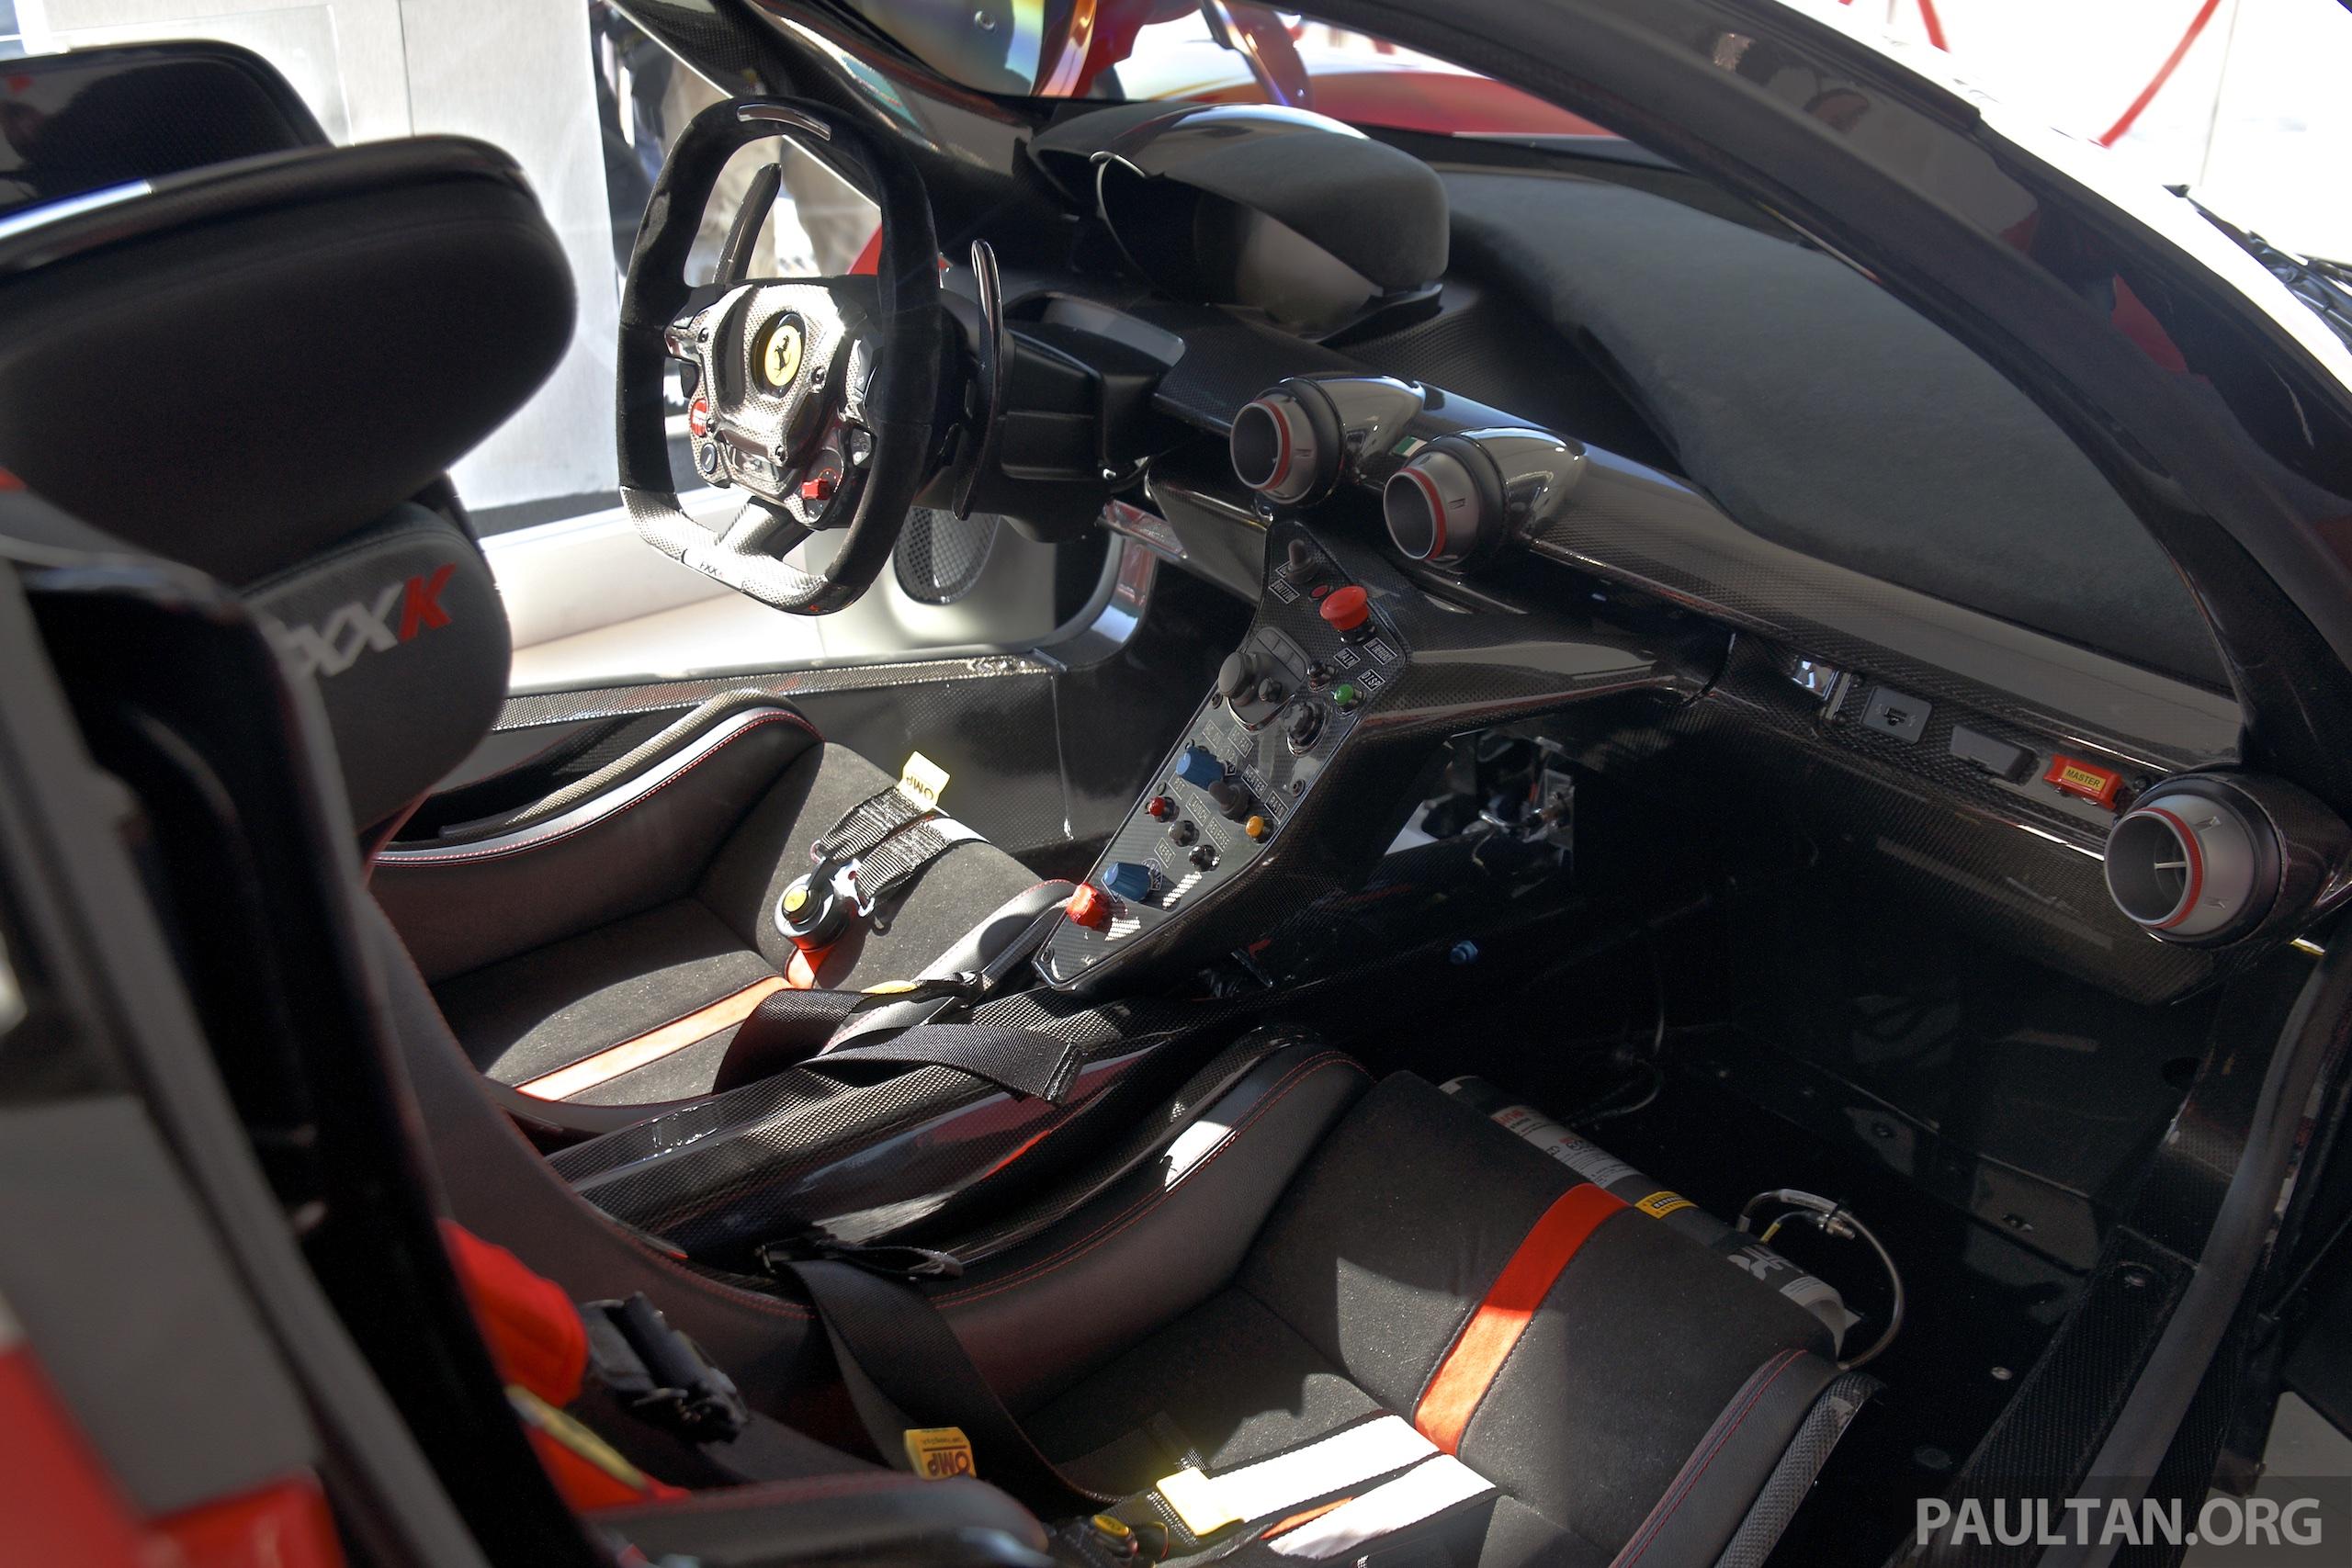 Ferrari Fxx K 19 Paul Tan S Automotive News